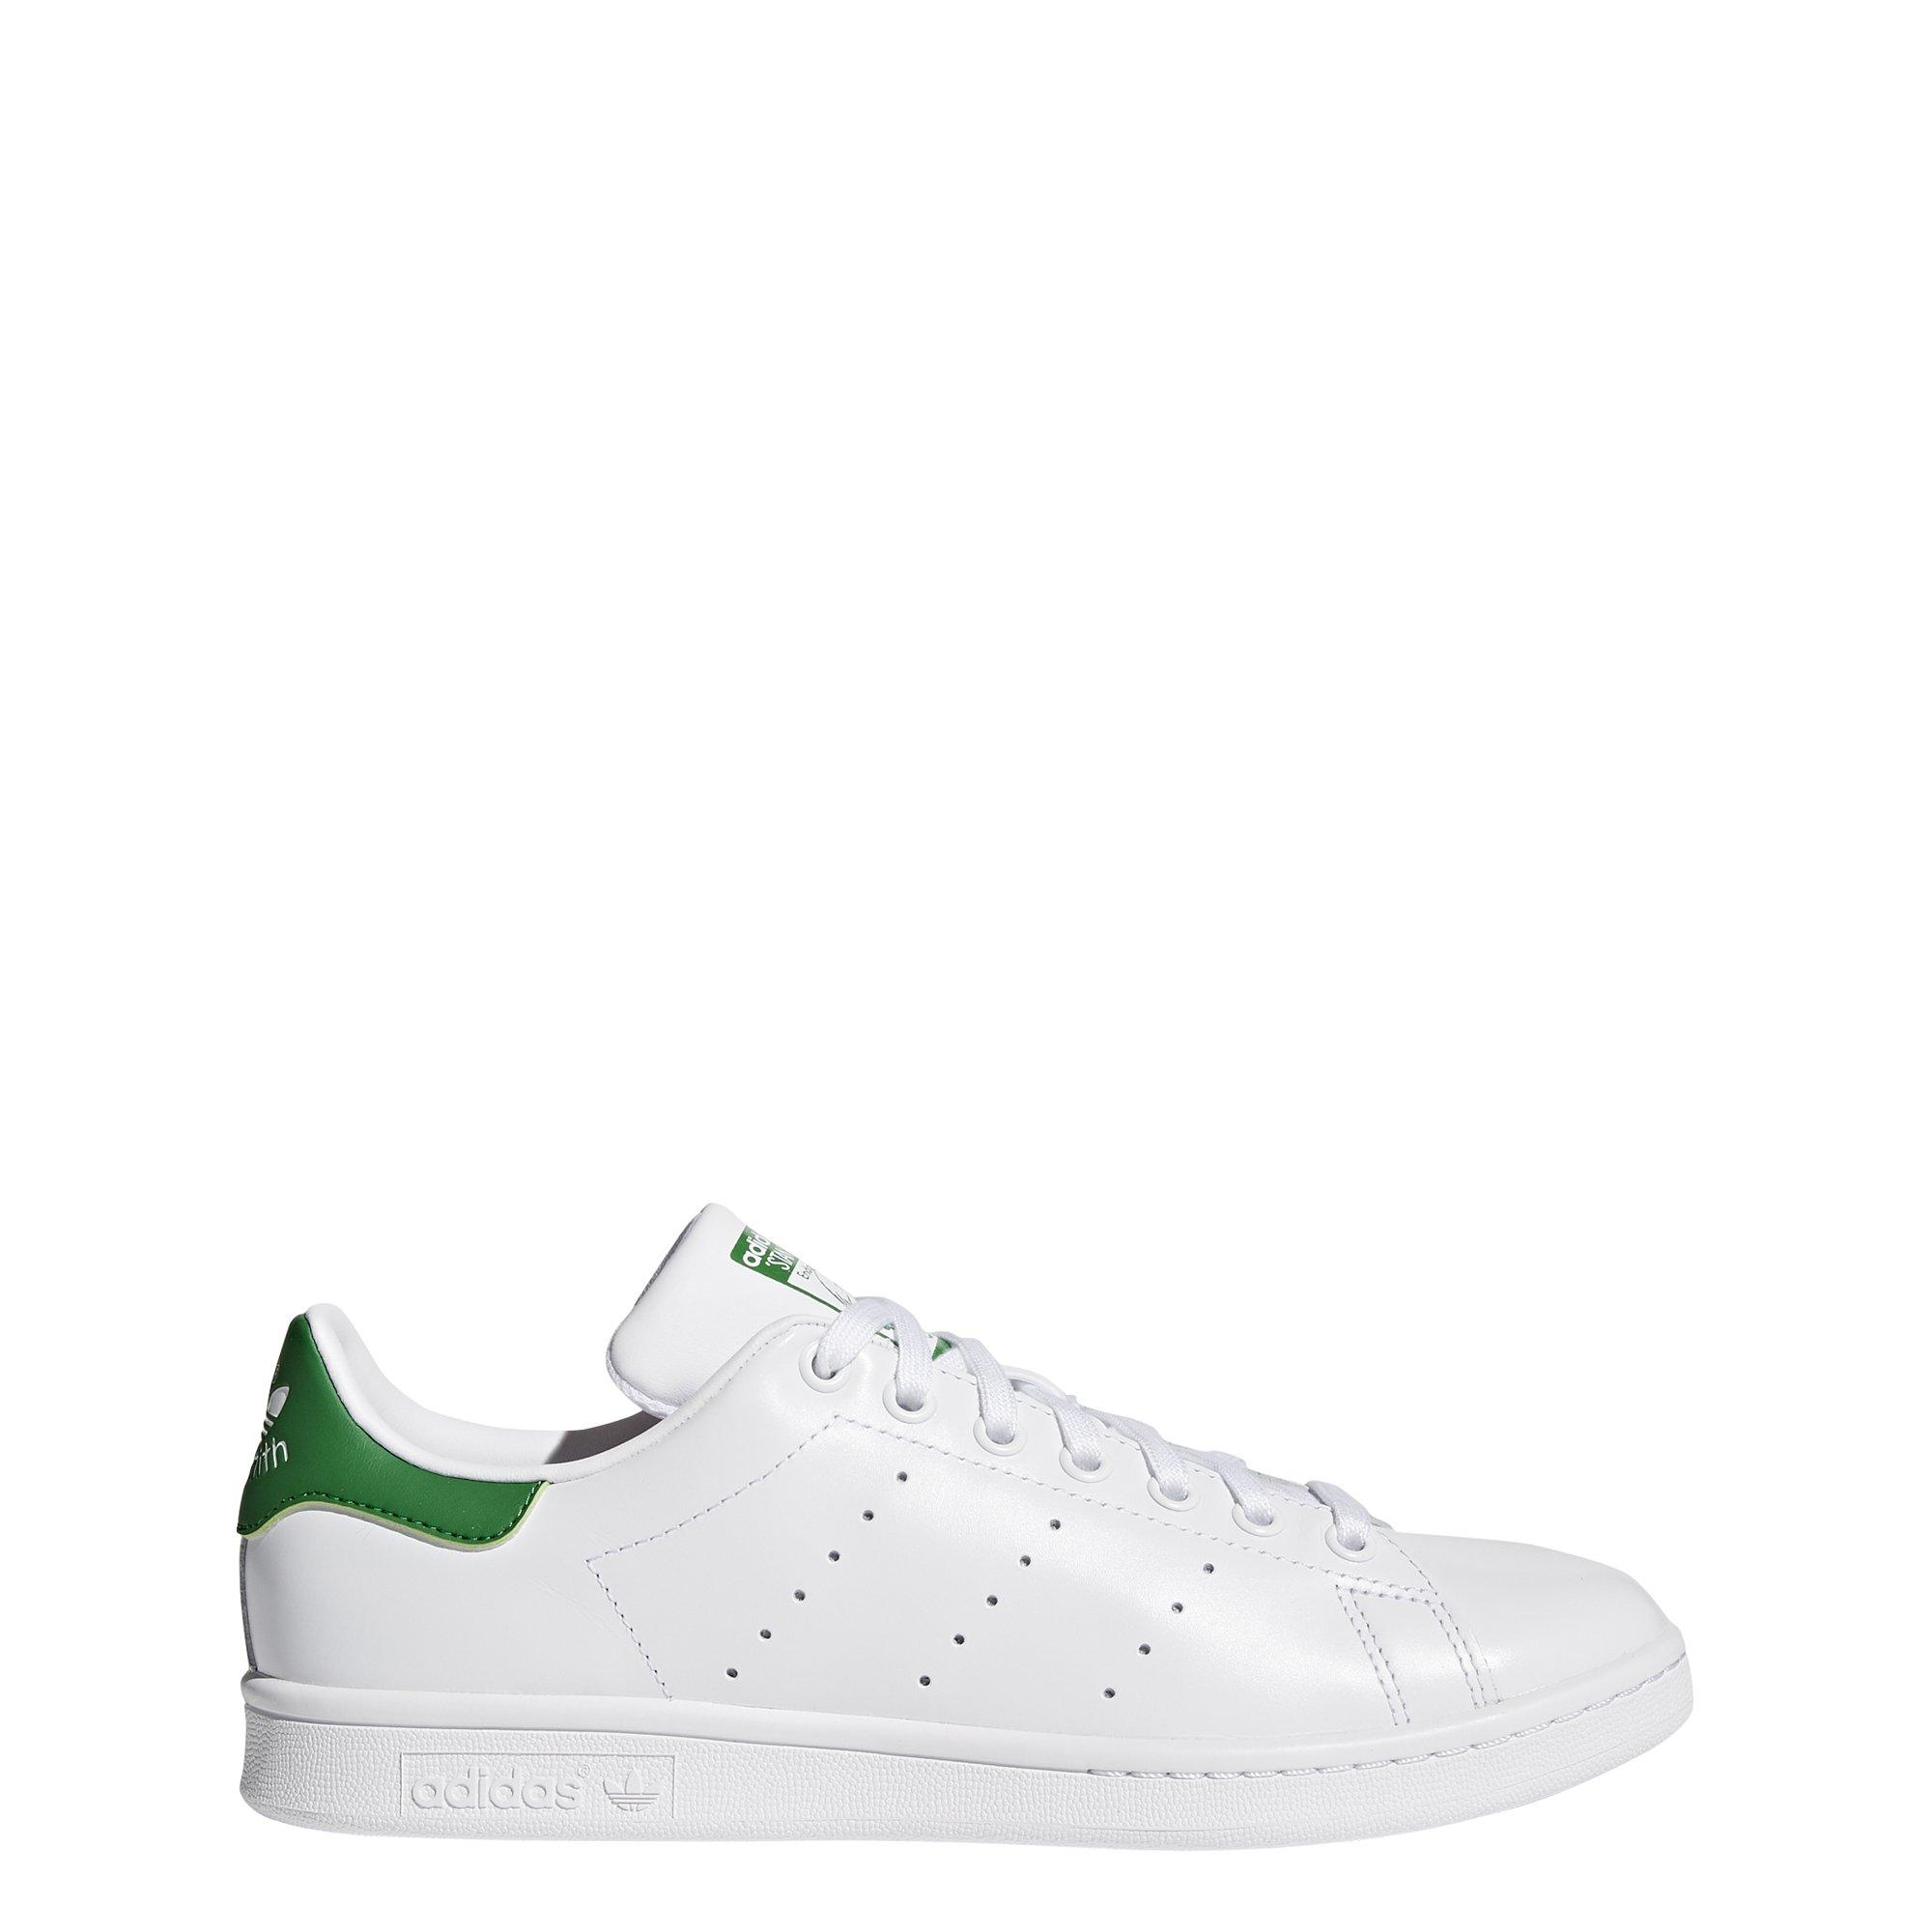 adidas Men's Originals Stan Smith Sneaker, White/White/Fairway, 13 M US